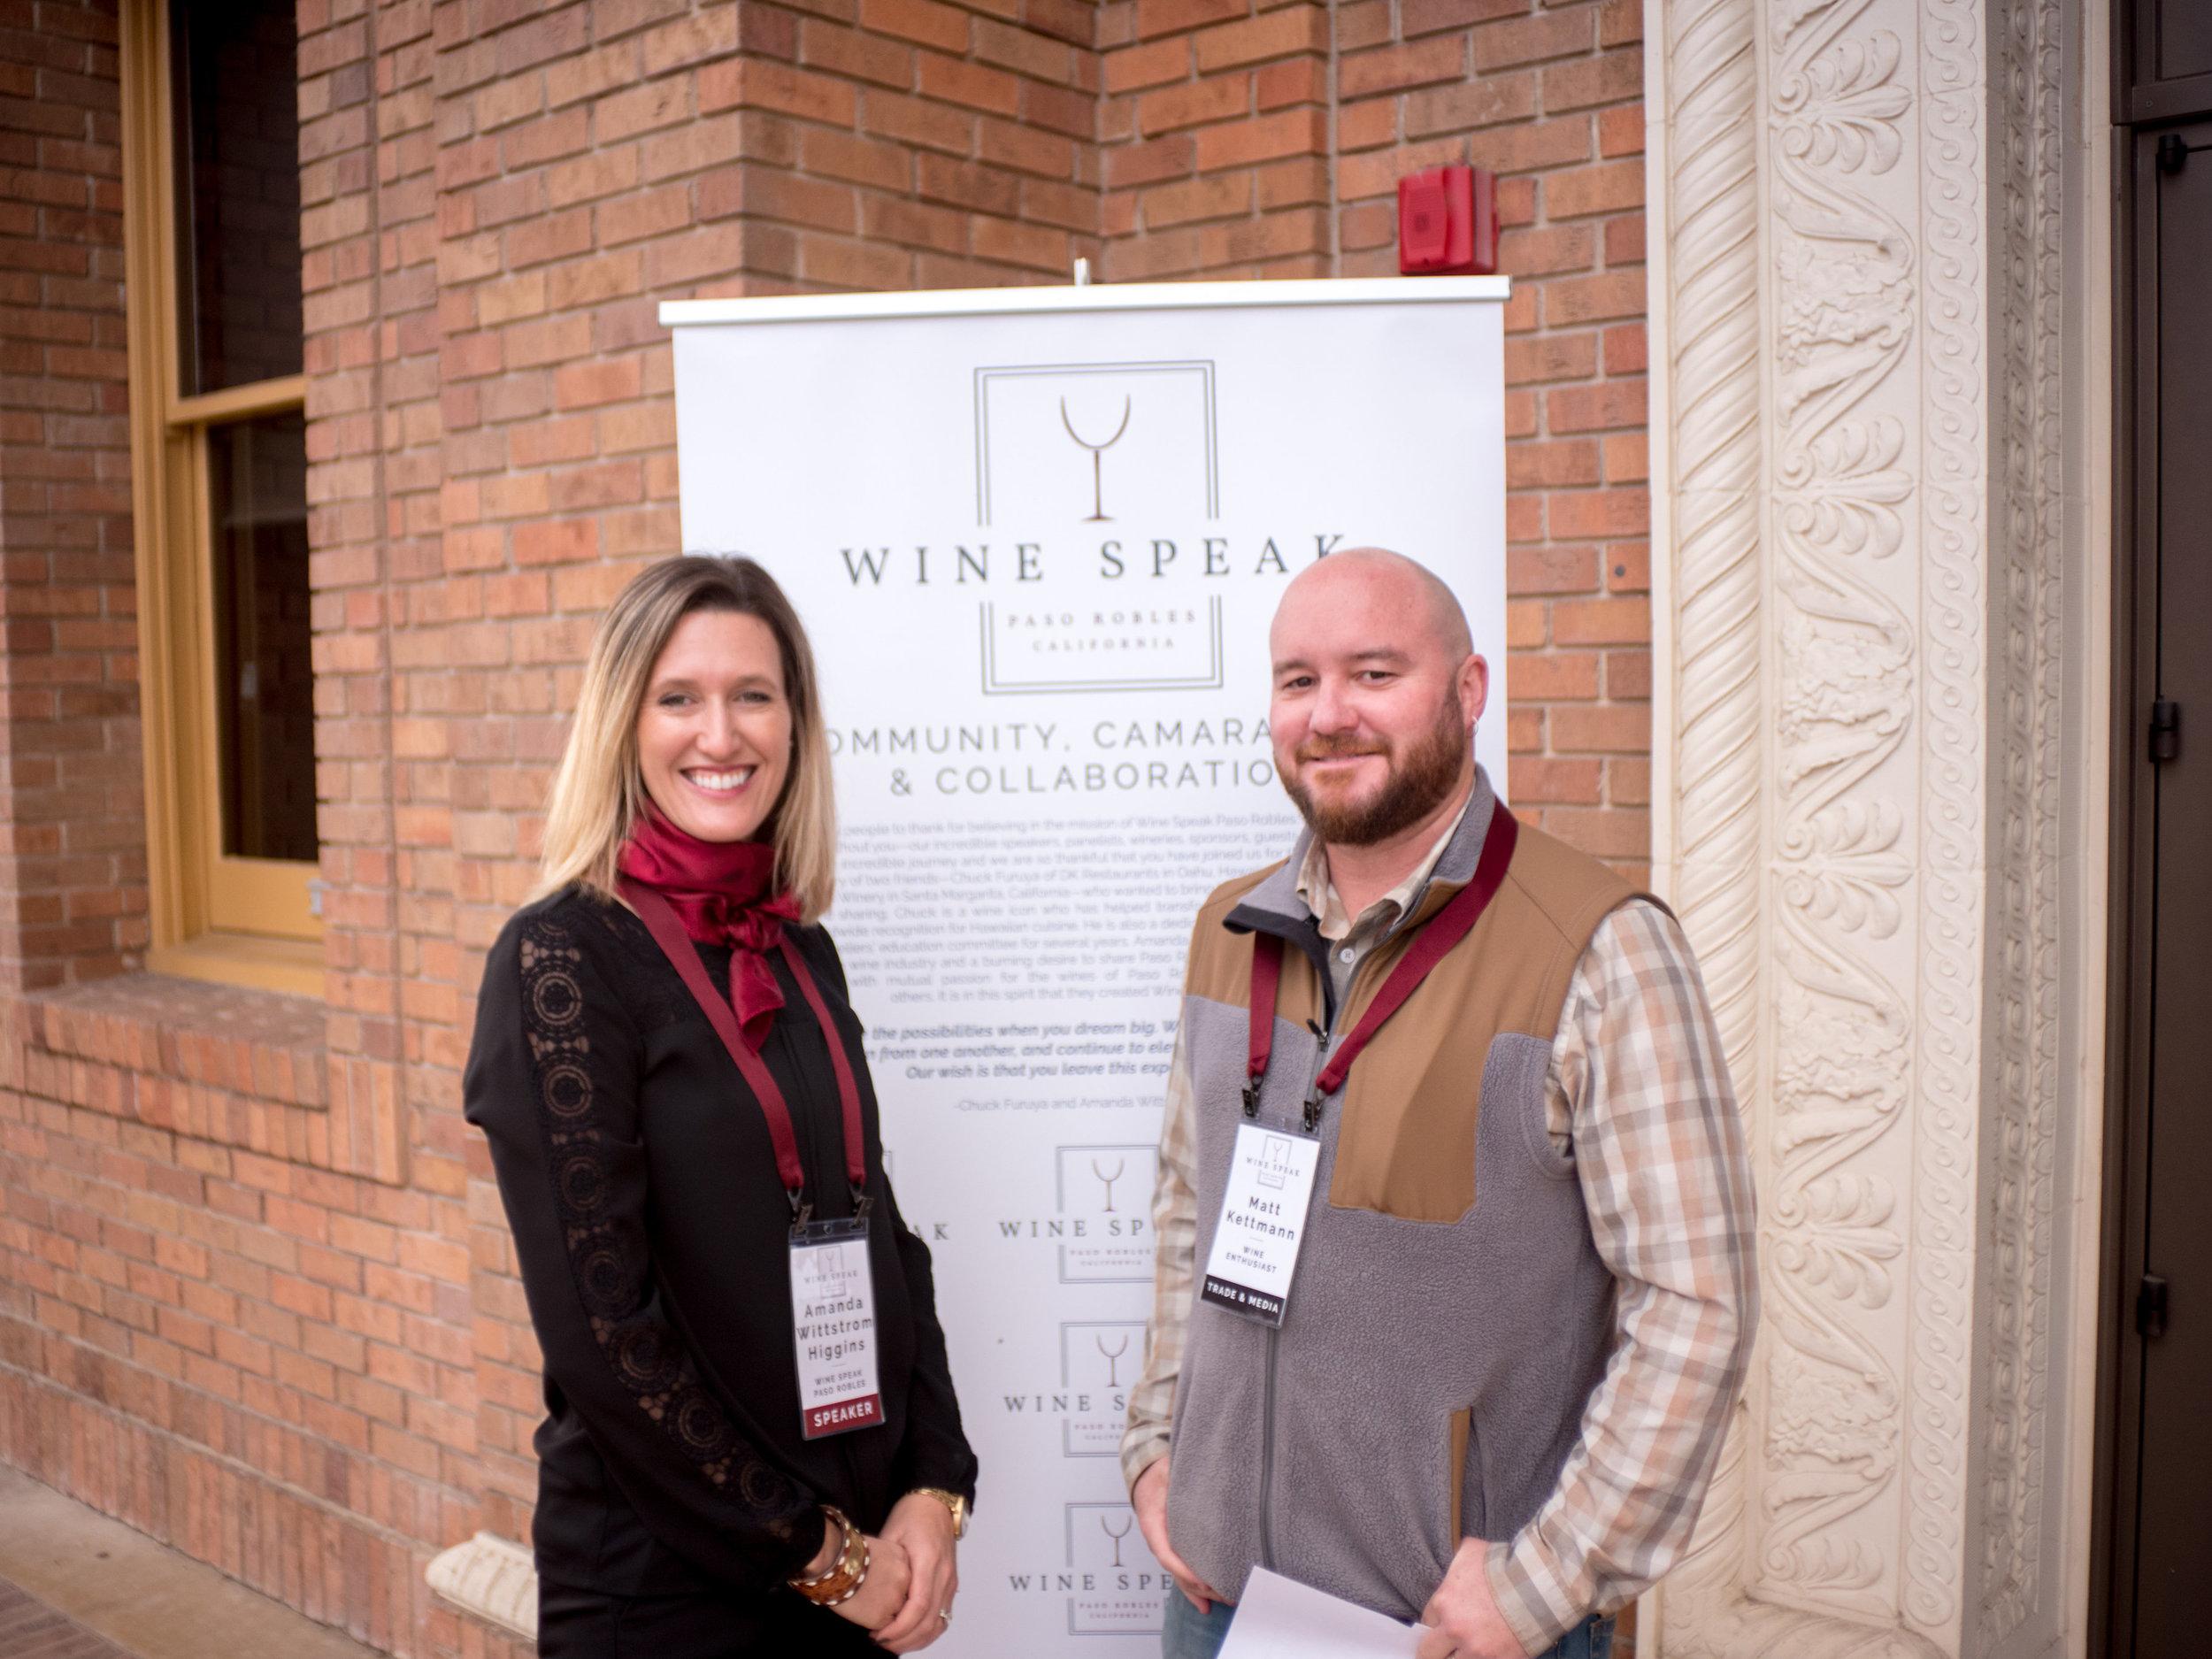 Amanda Wittstrom Higgins & Matt Kettmann at the inaugural Wine Speak event.